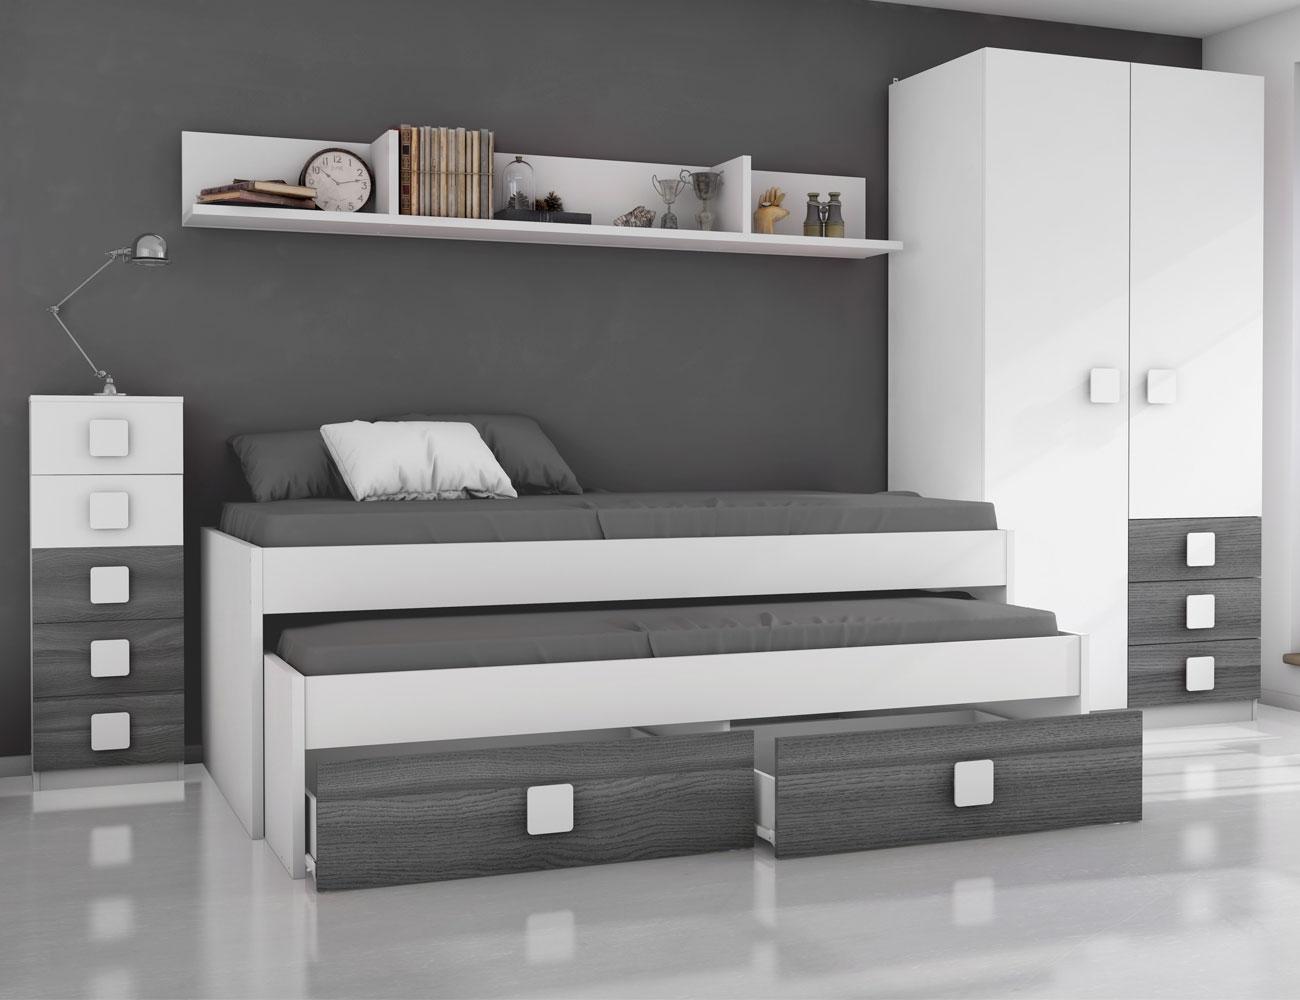 Dormitorio juvenil ceniza blanco4